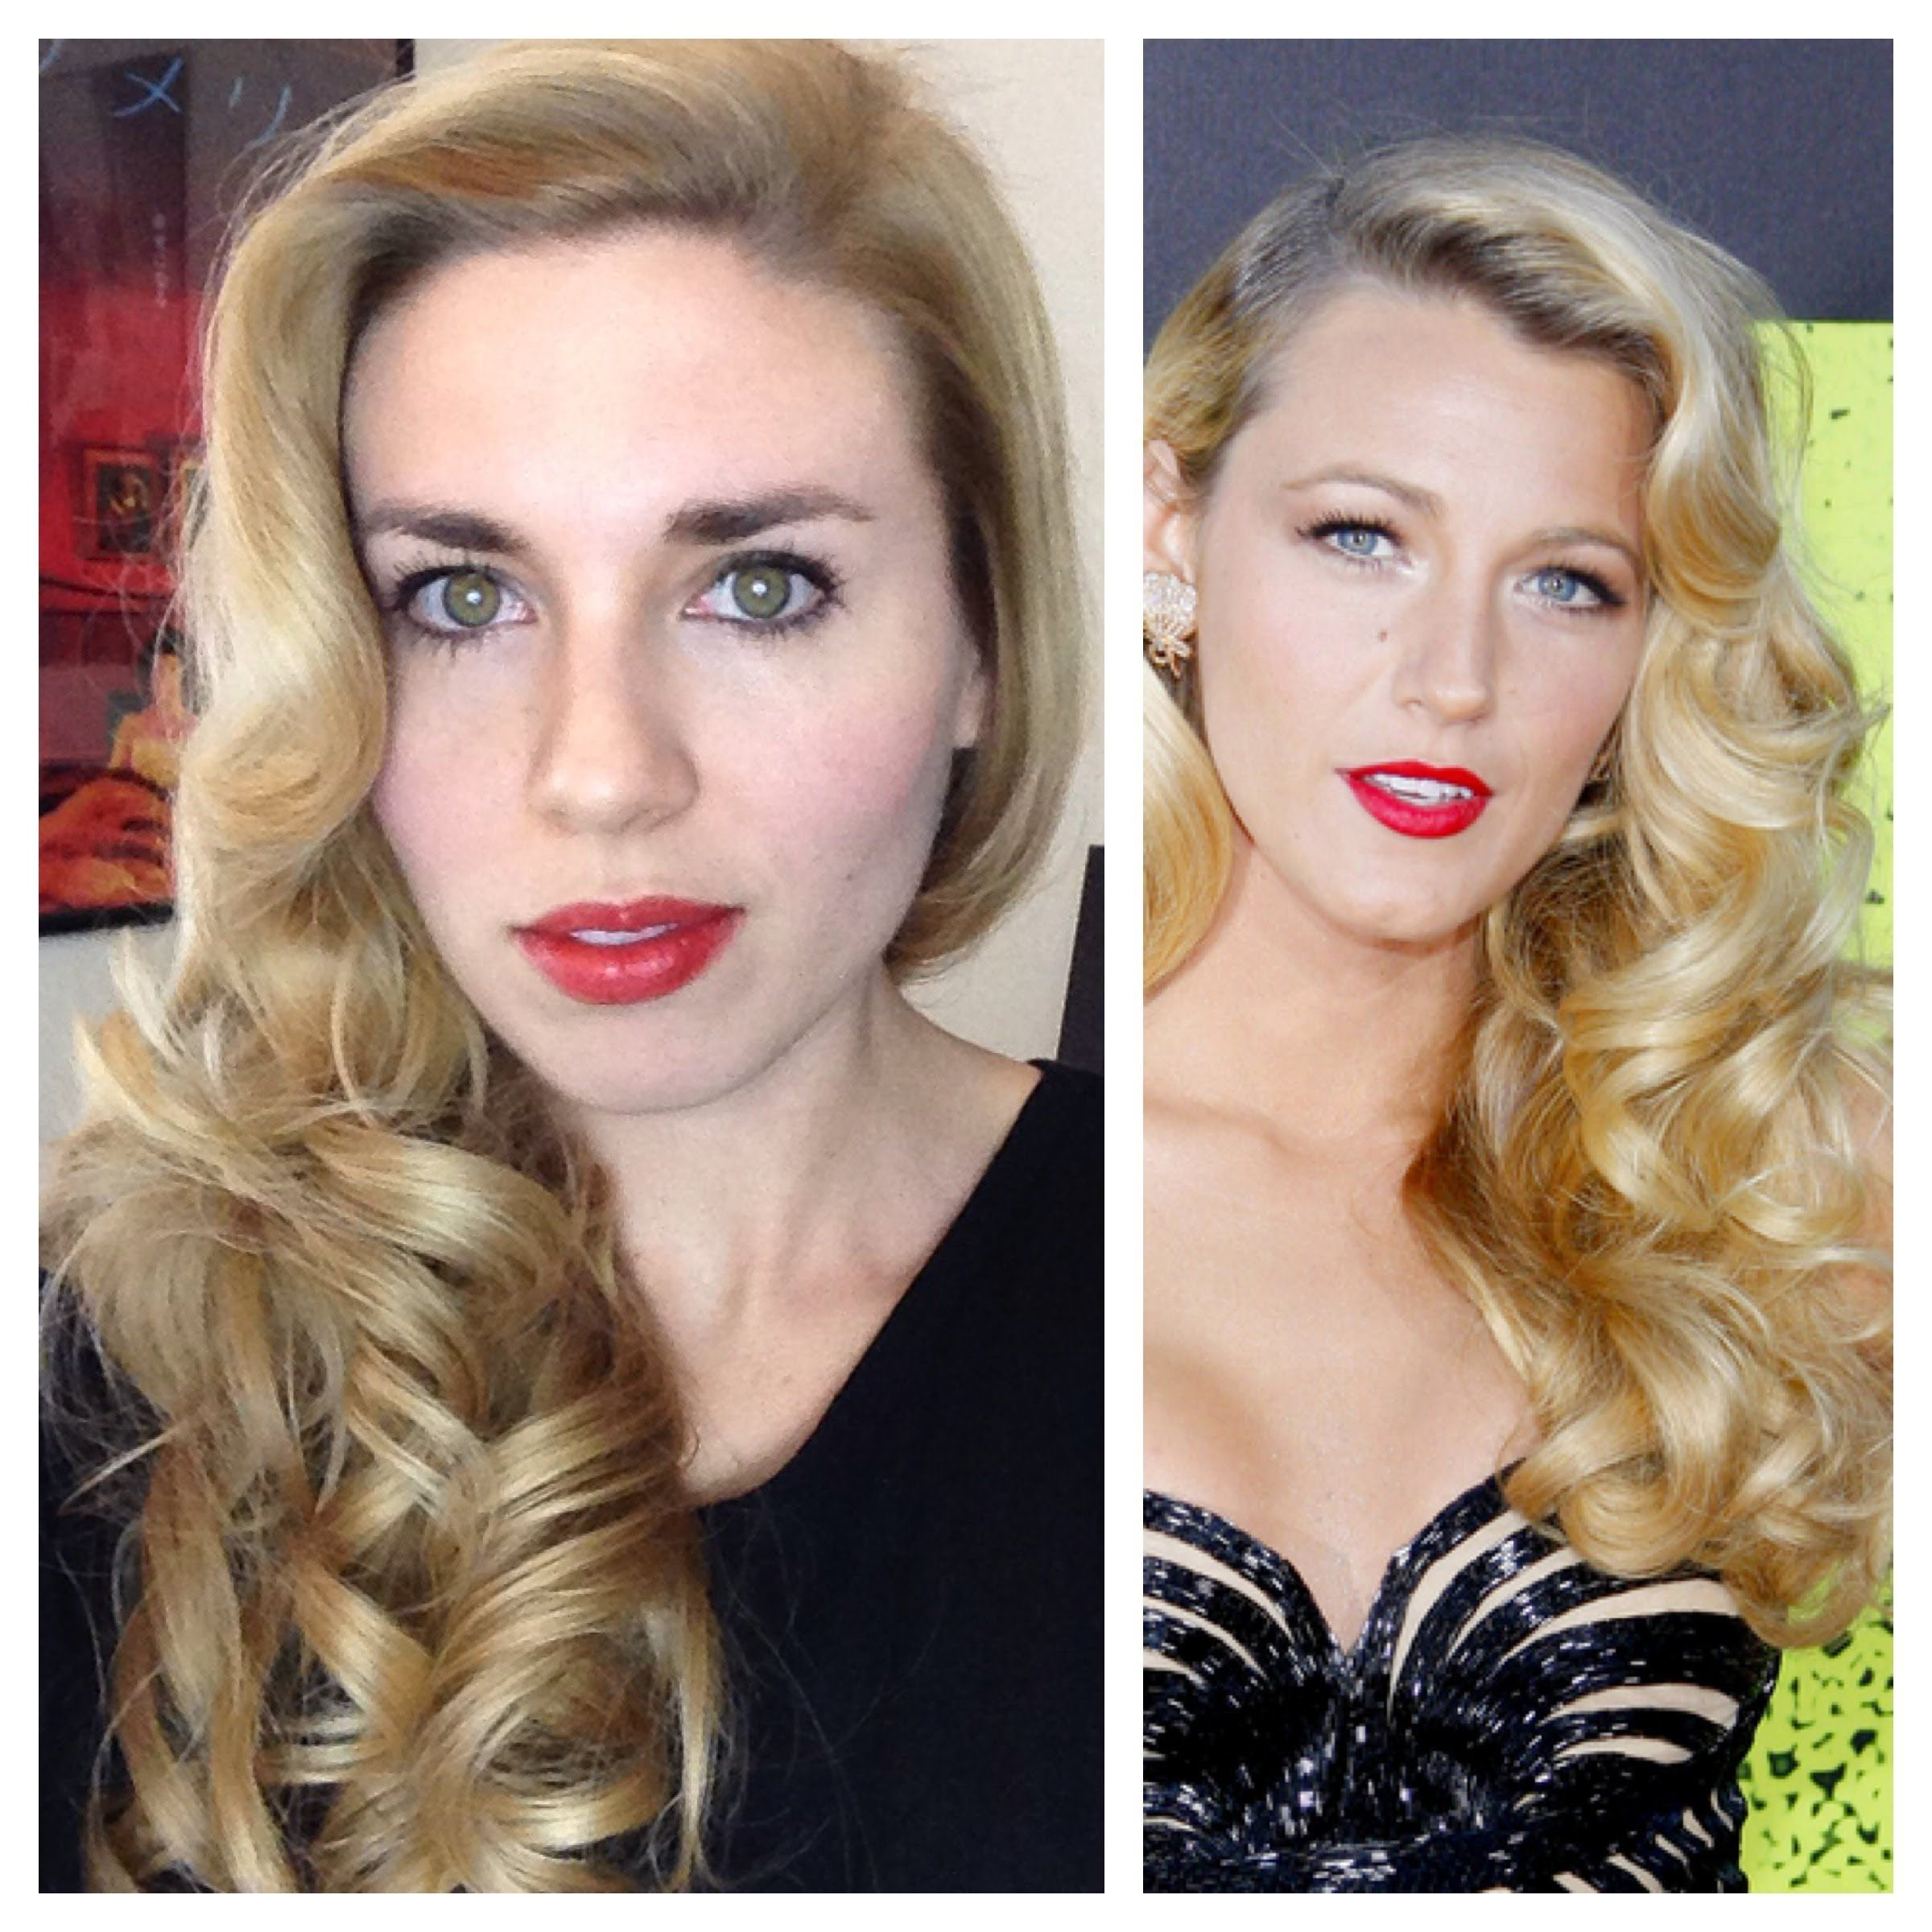 blake lively retro curls - vintage old hollywood glamour